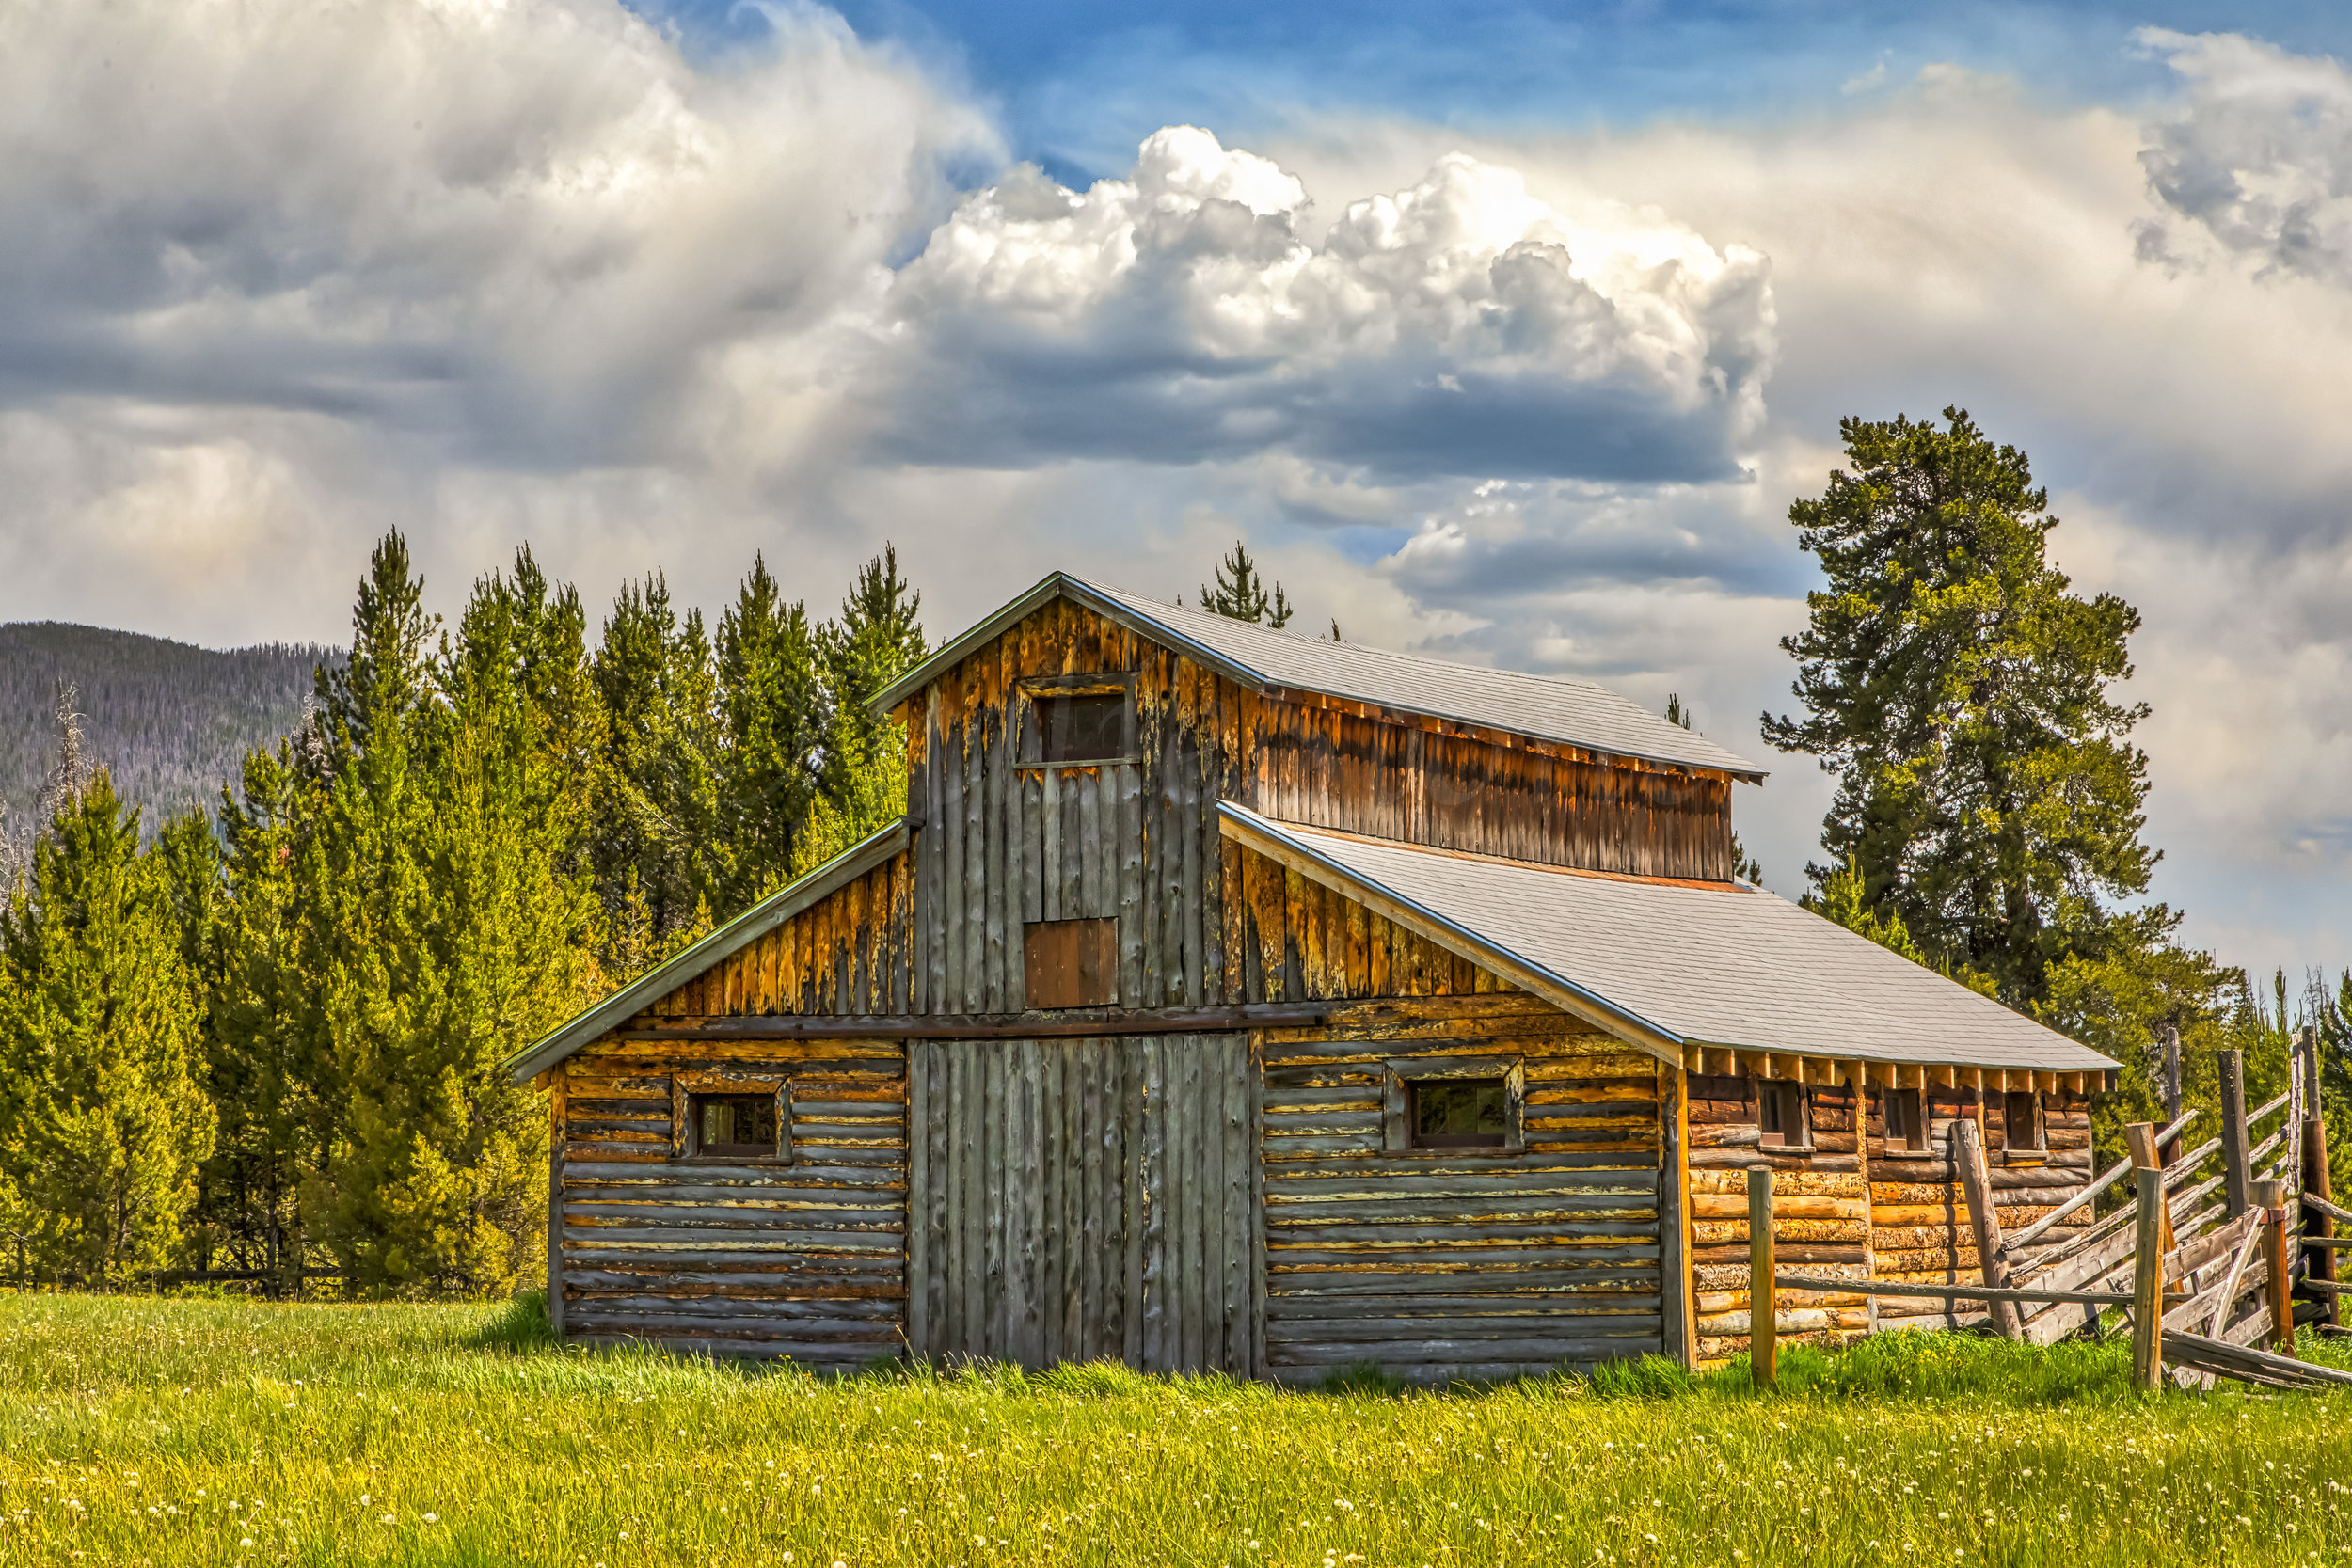 Little Buckaroo Barn, Image # 1310